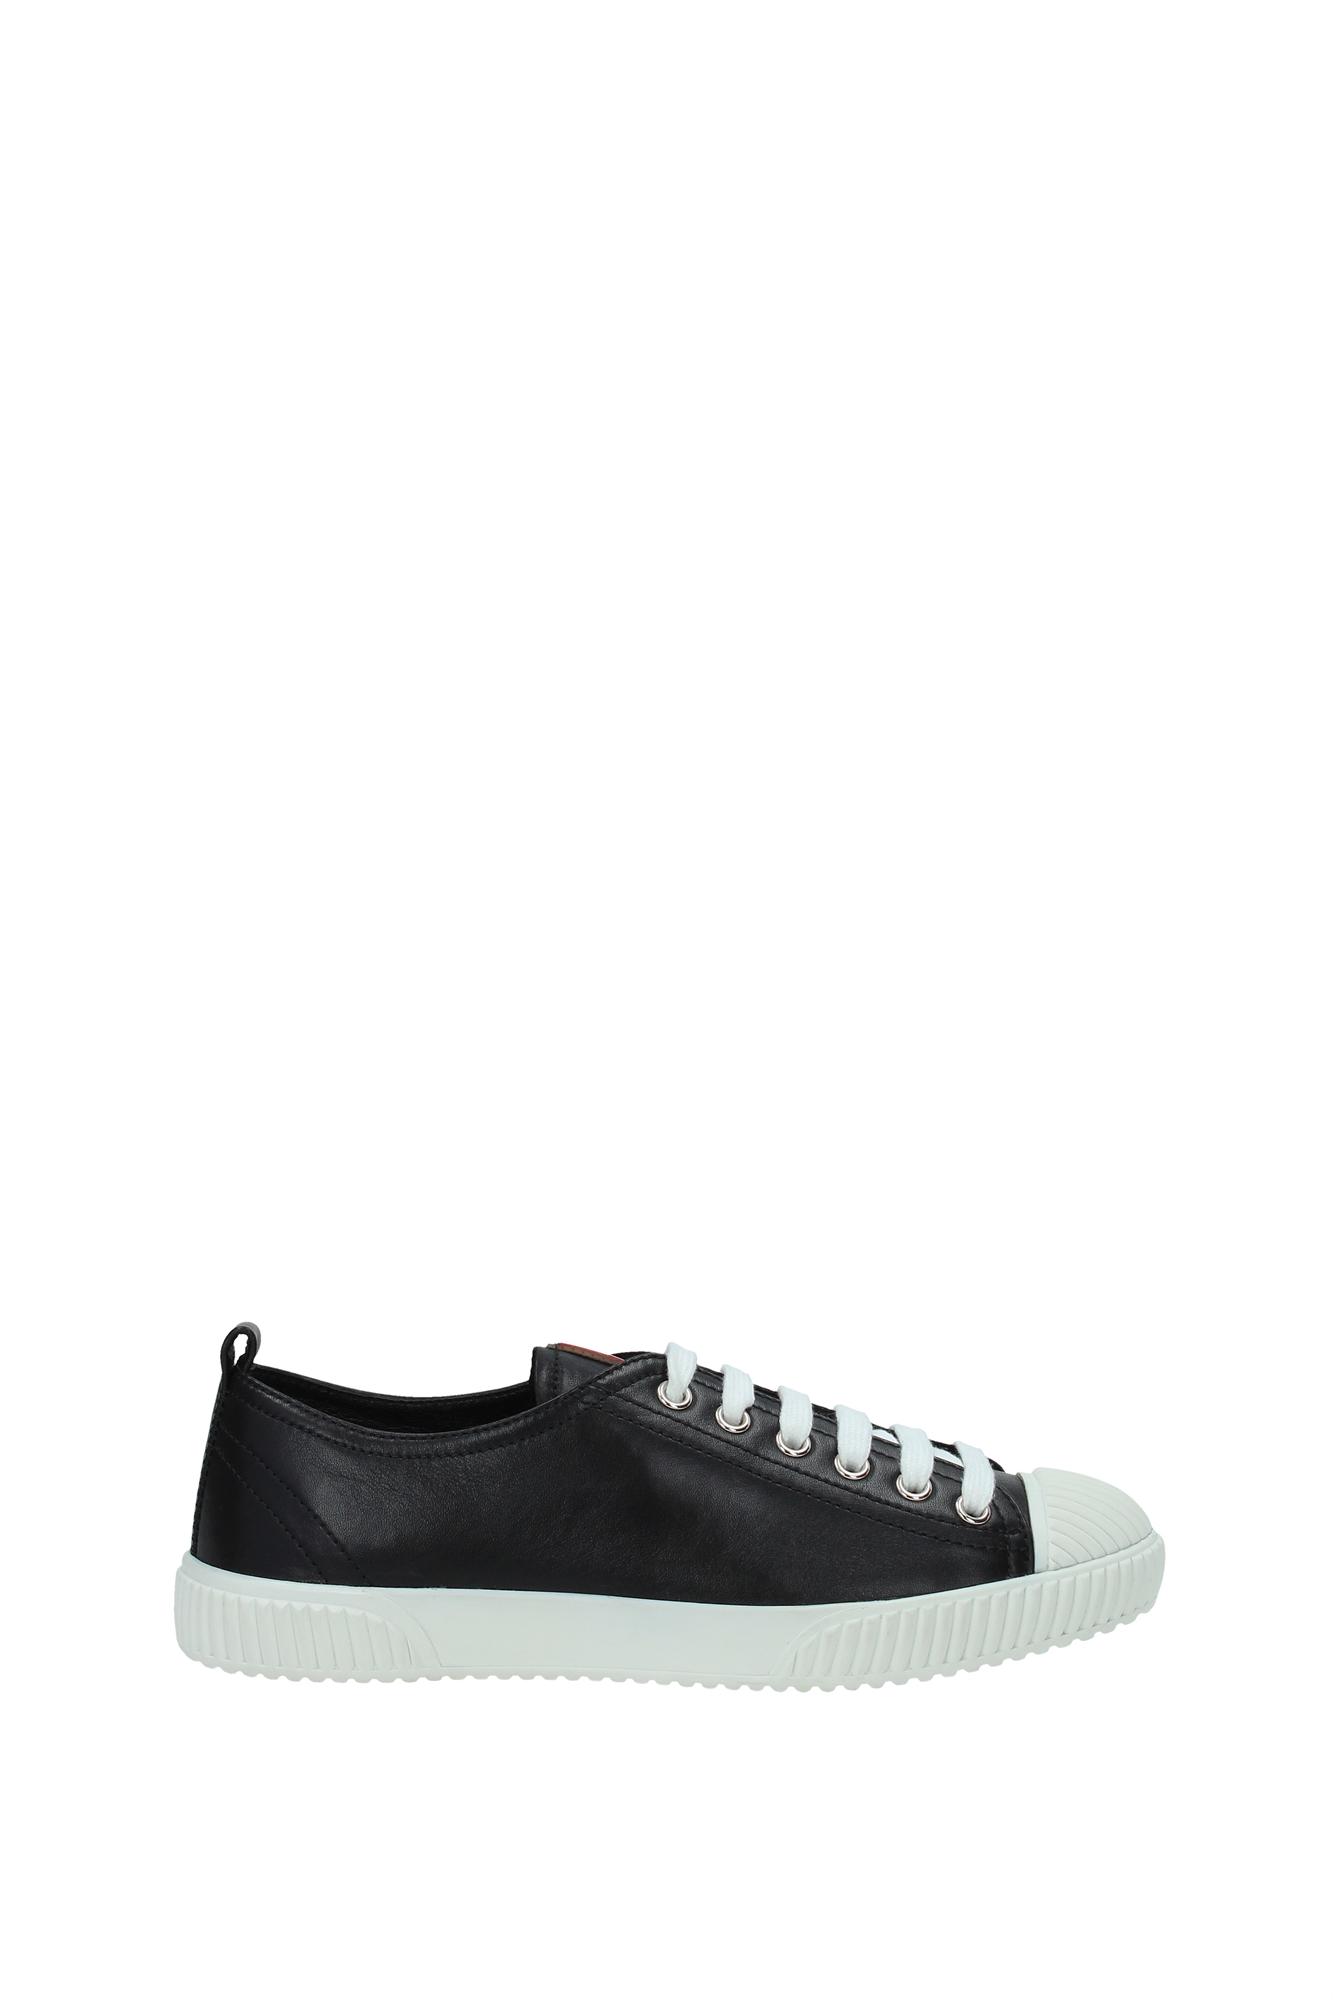 sneakers prada damen leder schwarz 3e5876nerobianco ebay. Black Bedroom Furniture Sets. Home Design Ideas